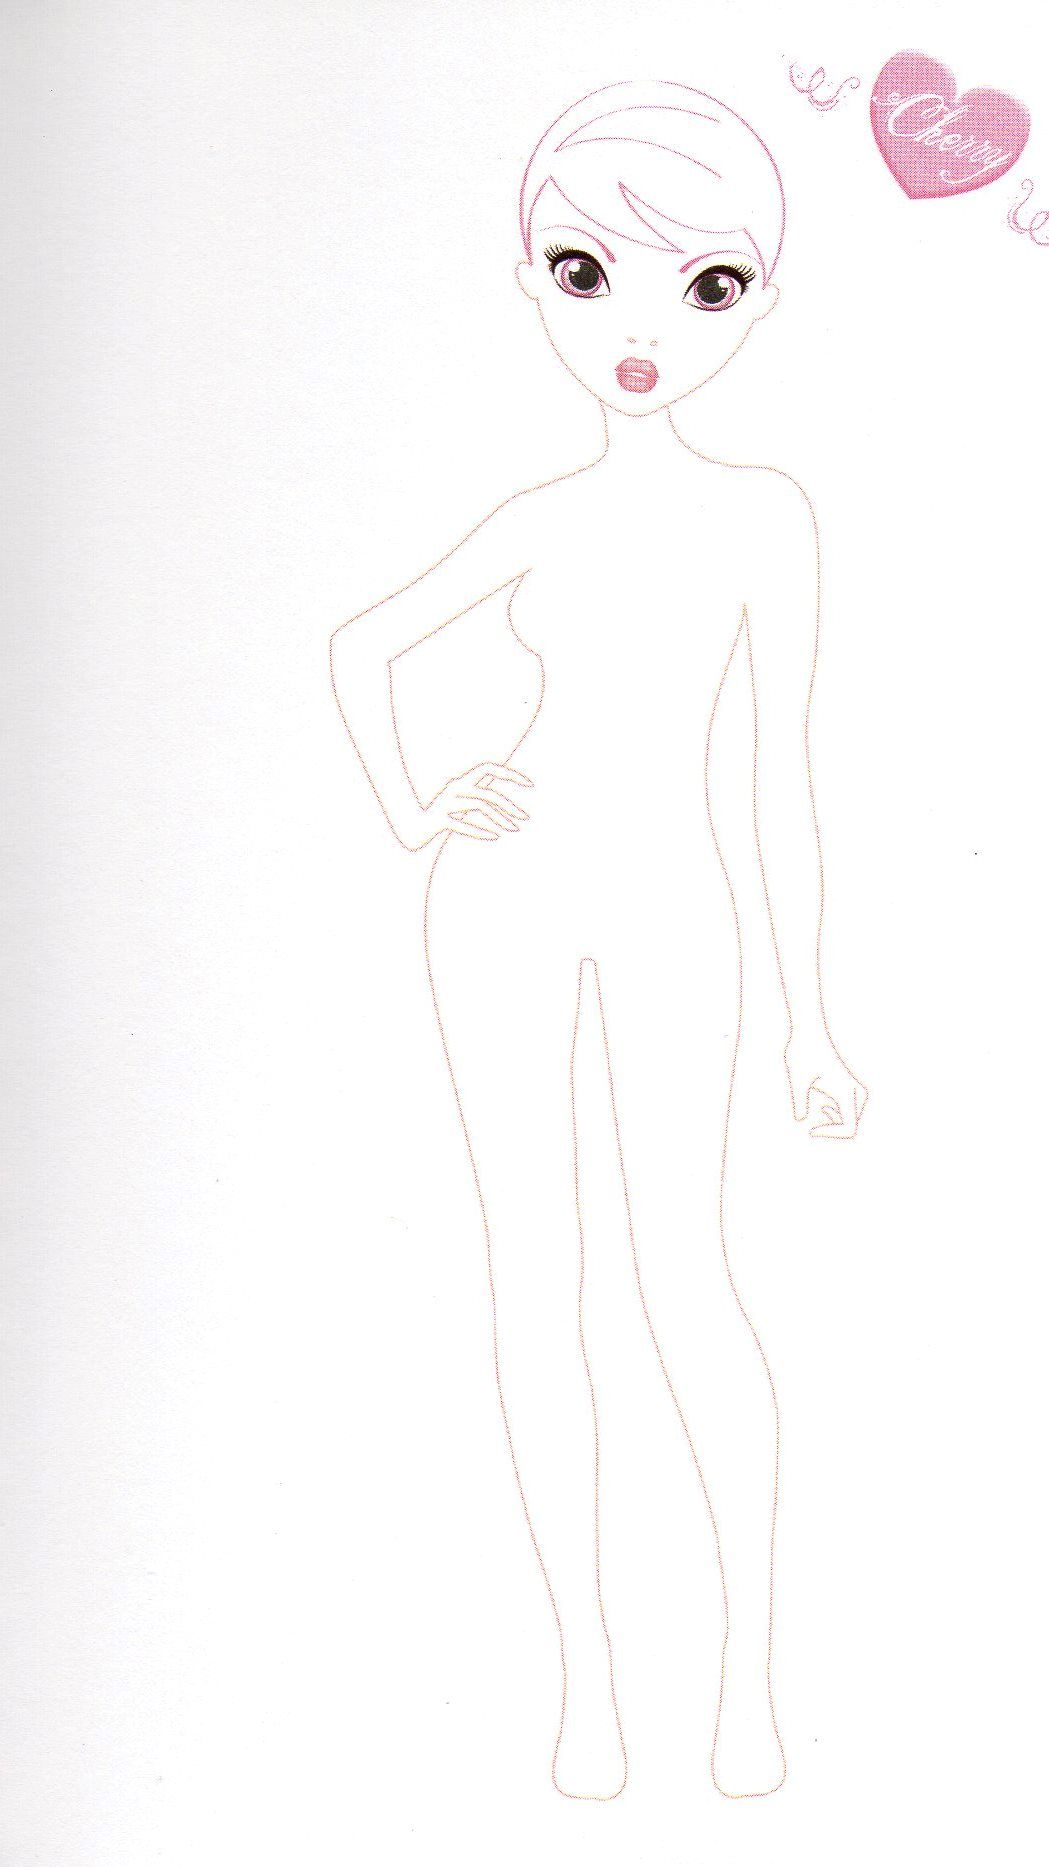 Ausmalbilder Topmodel Talita : Imagina Su Vestuario Top Model Biz Pinterest